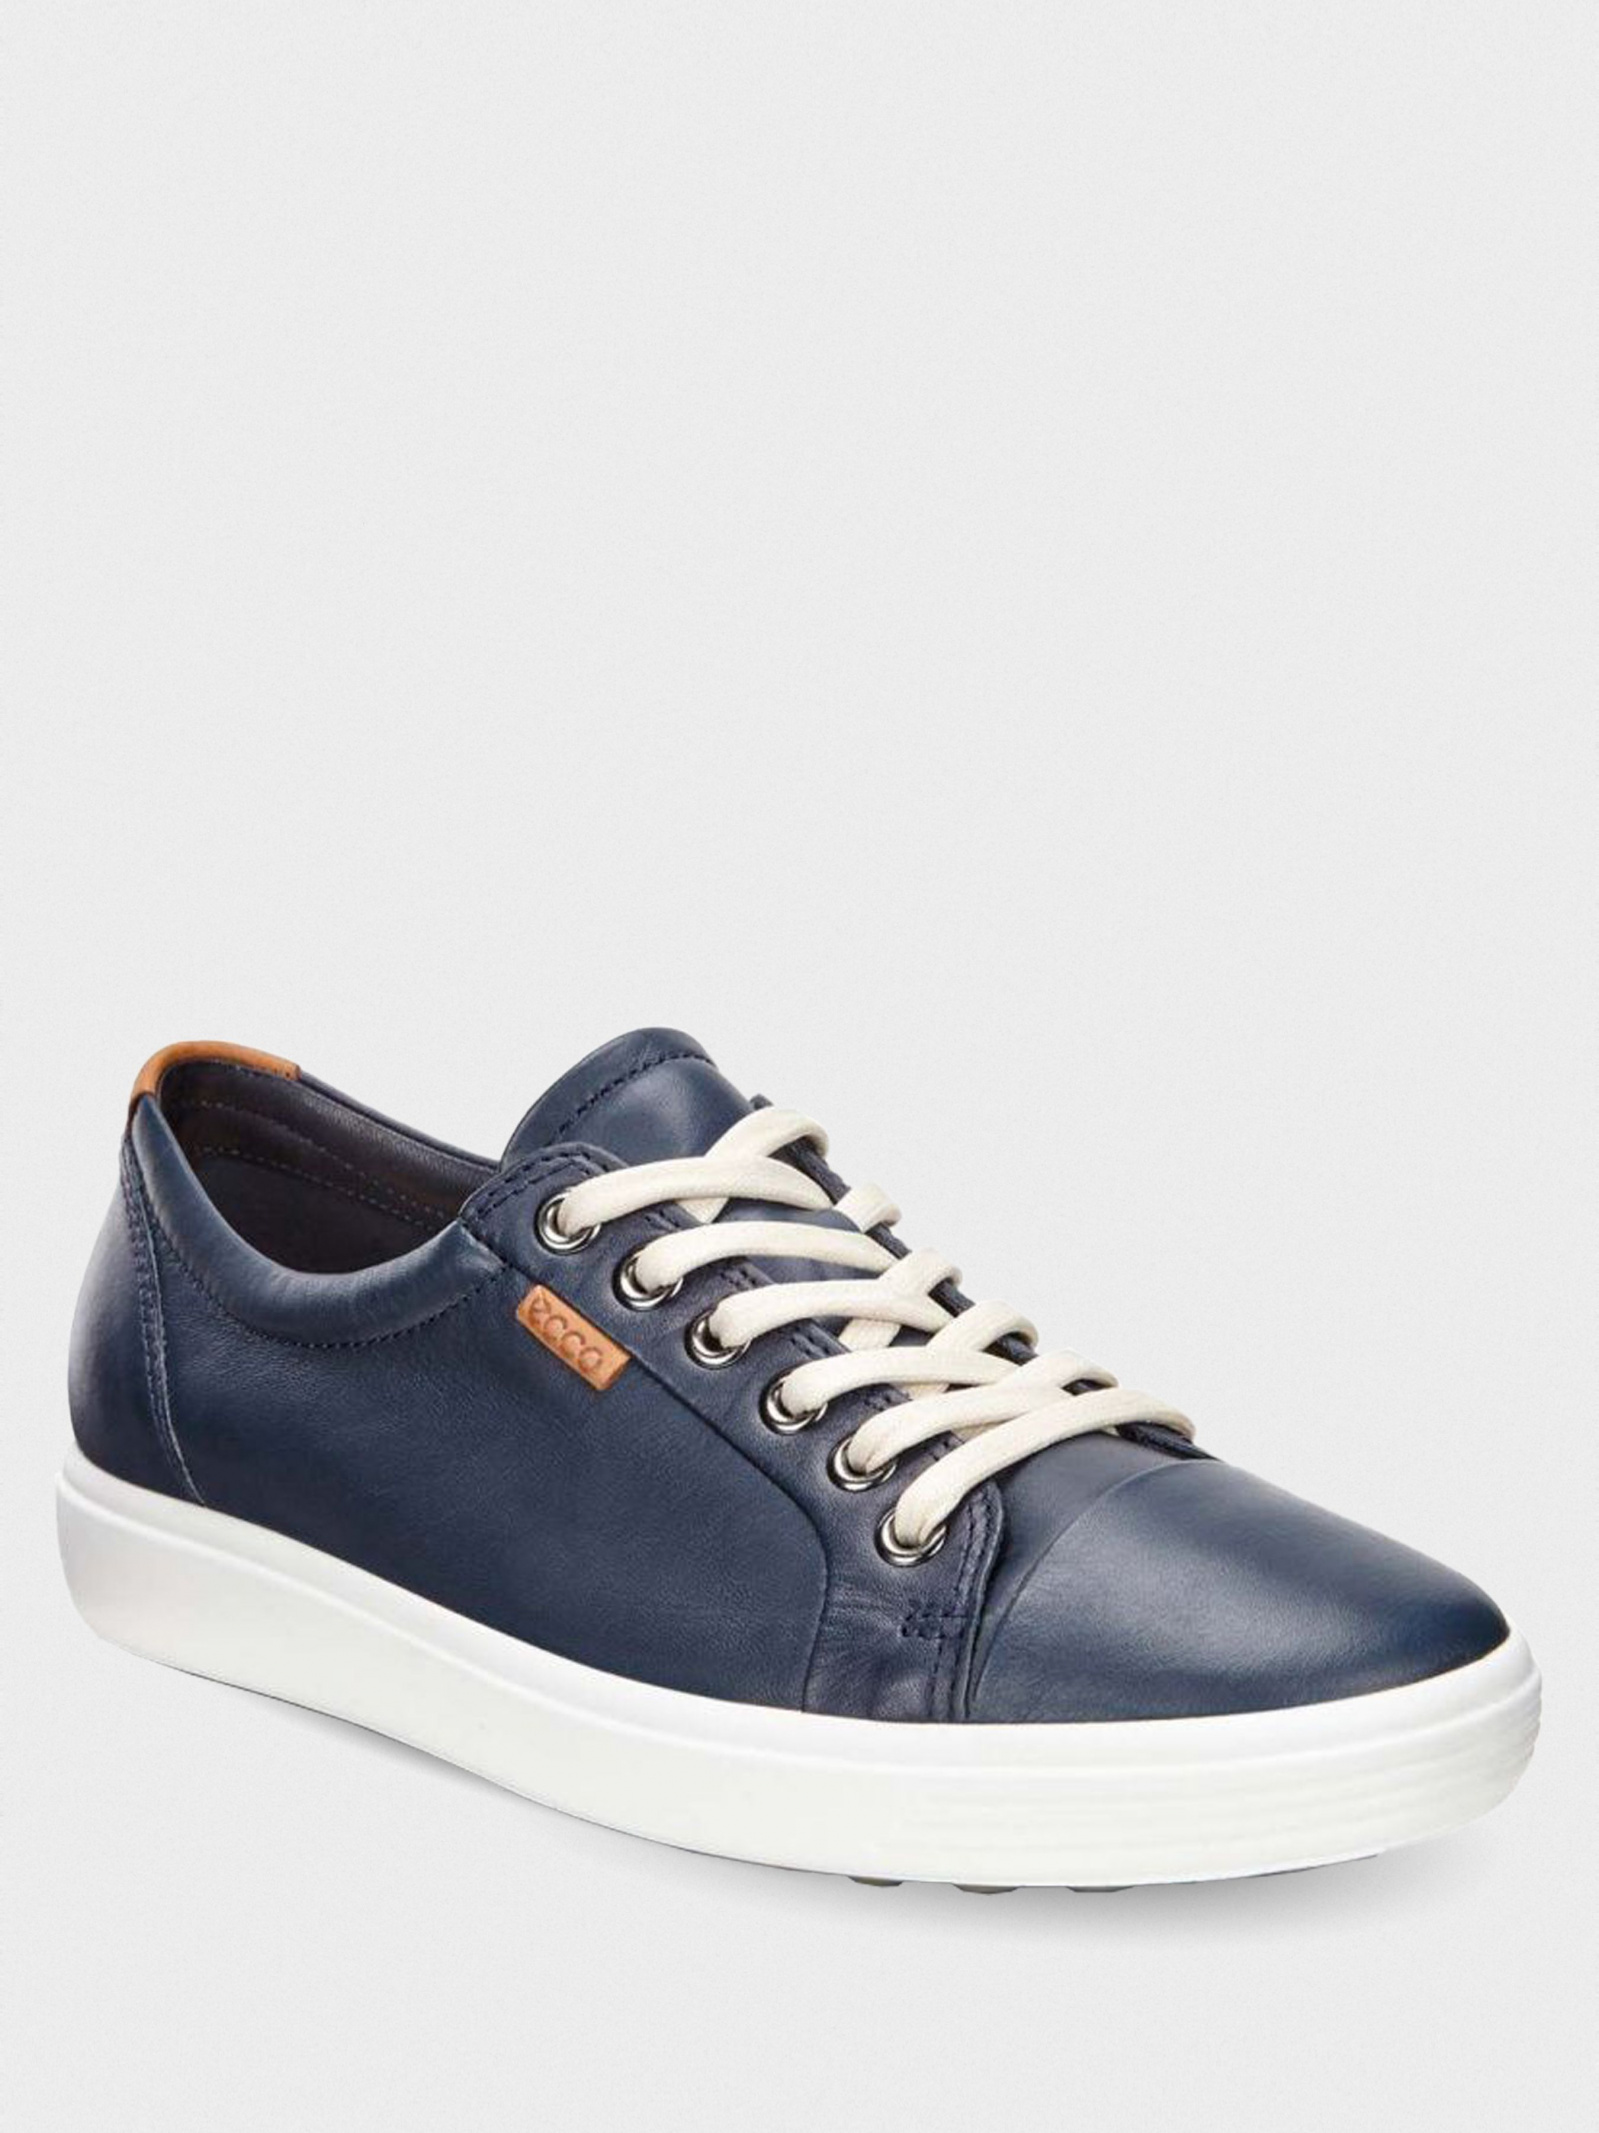 Полуботинки для женщин ECCO SOFT 7 430003(01038) цена обуви, 2017